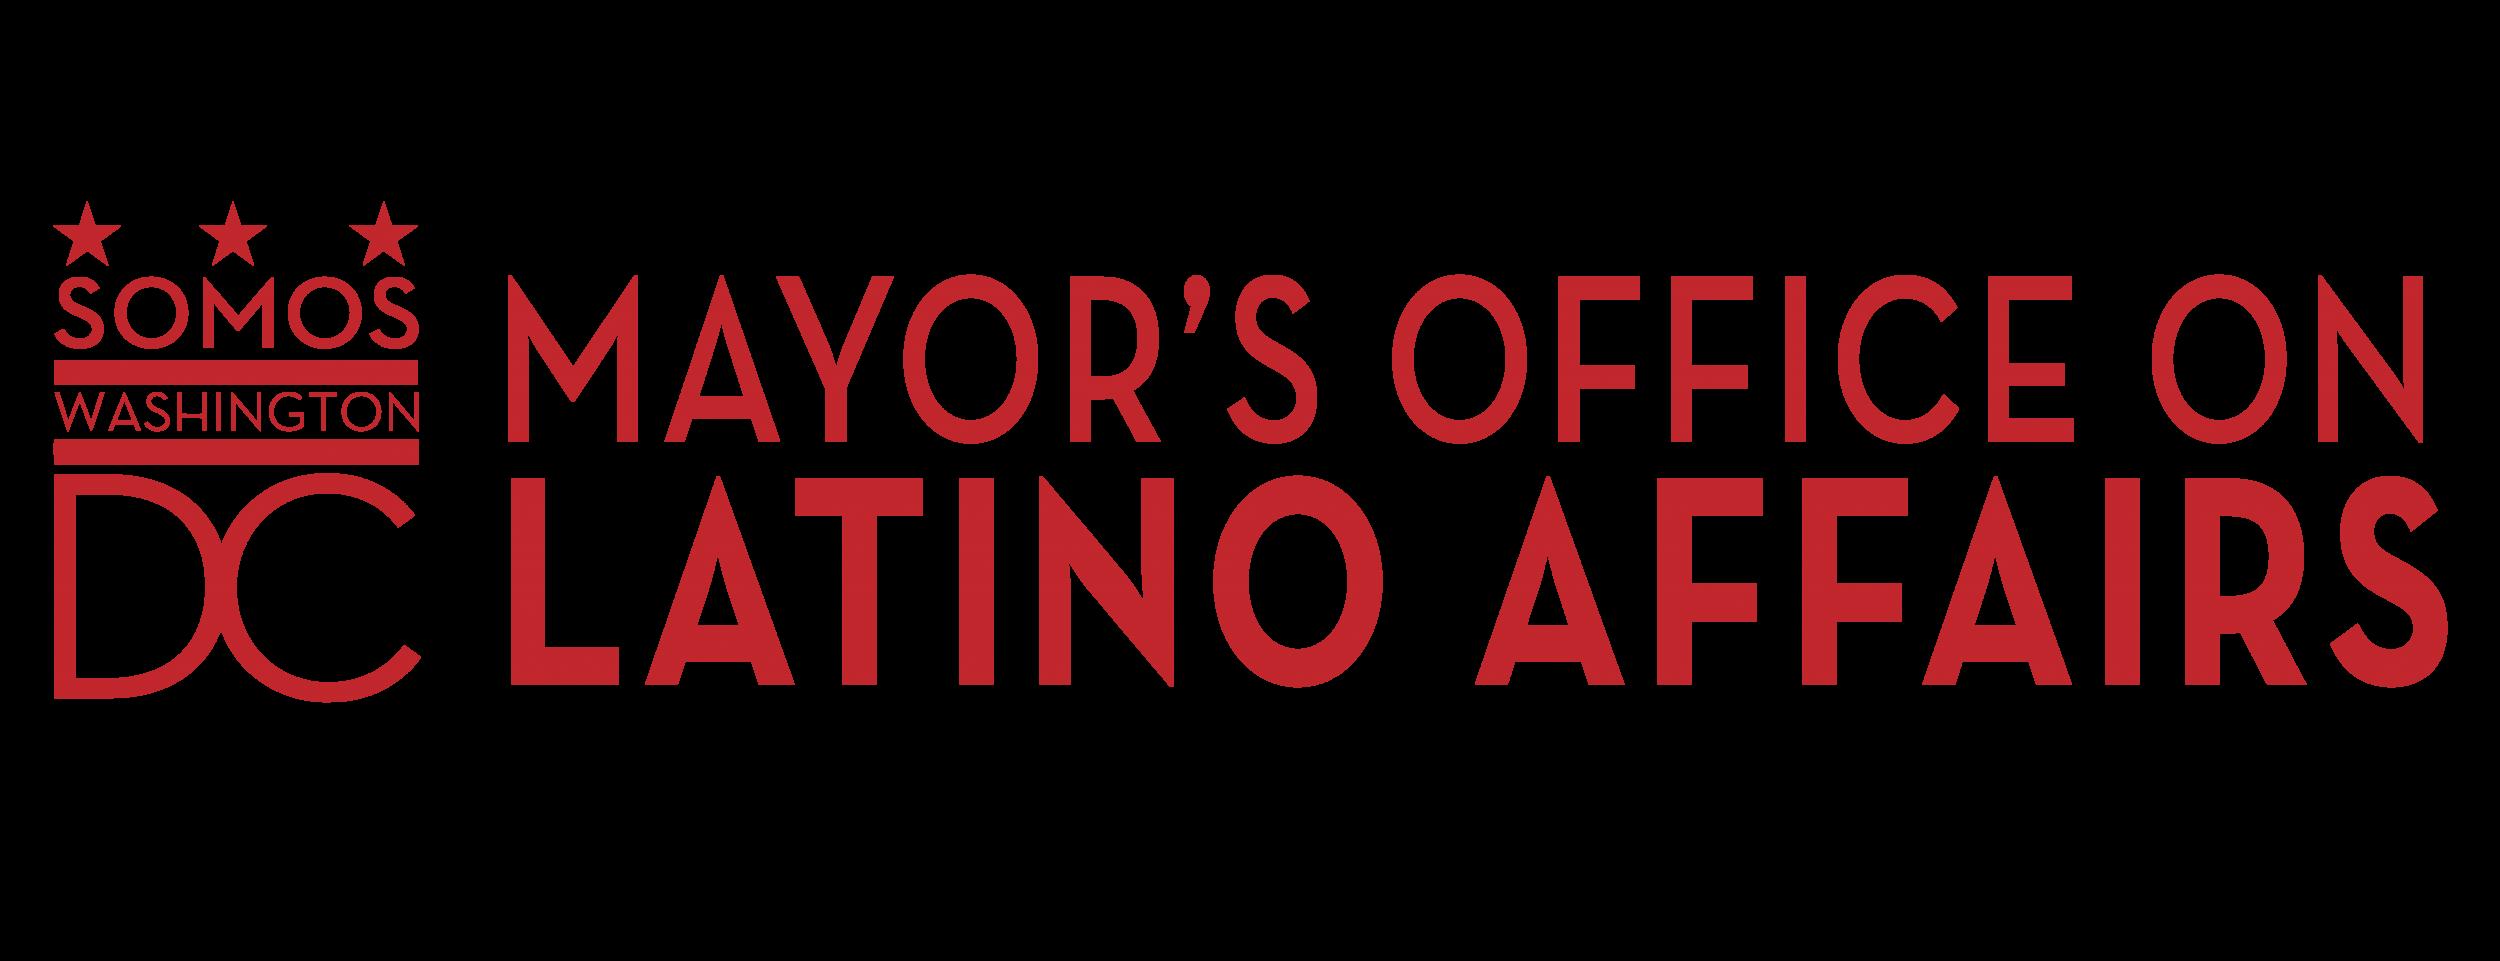 DC Mayor's Office on Latino Affairs